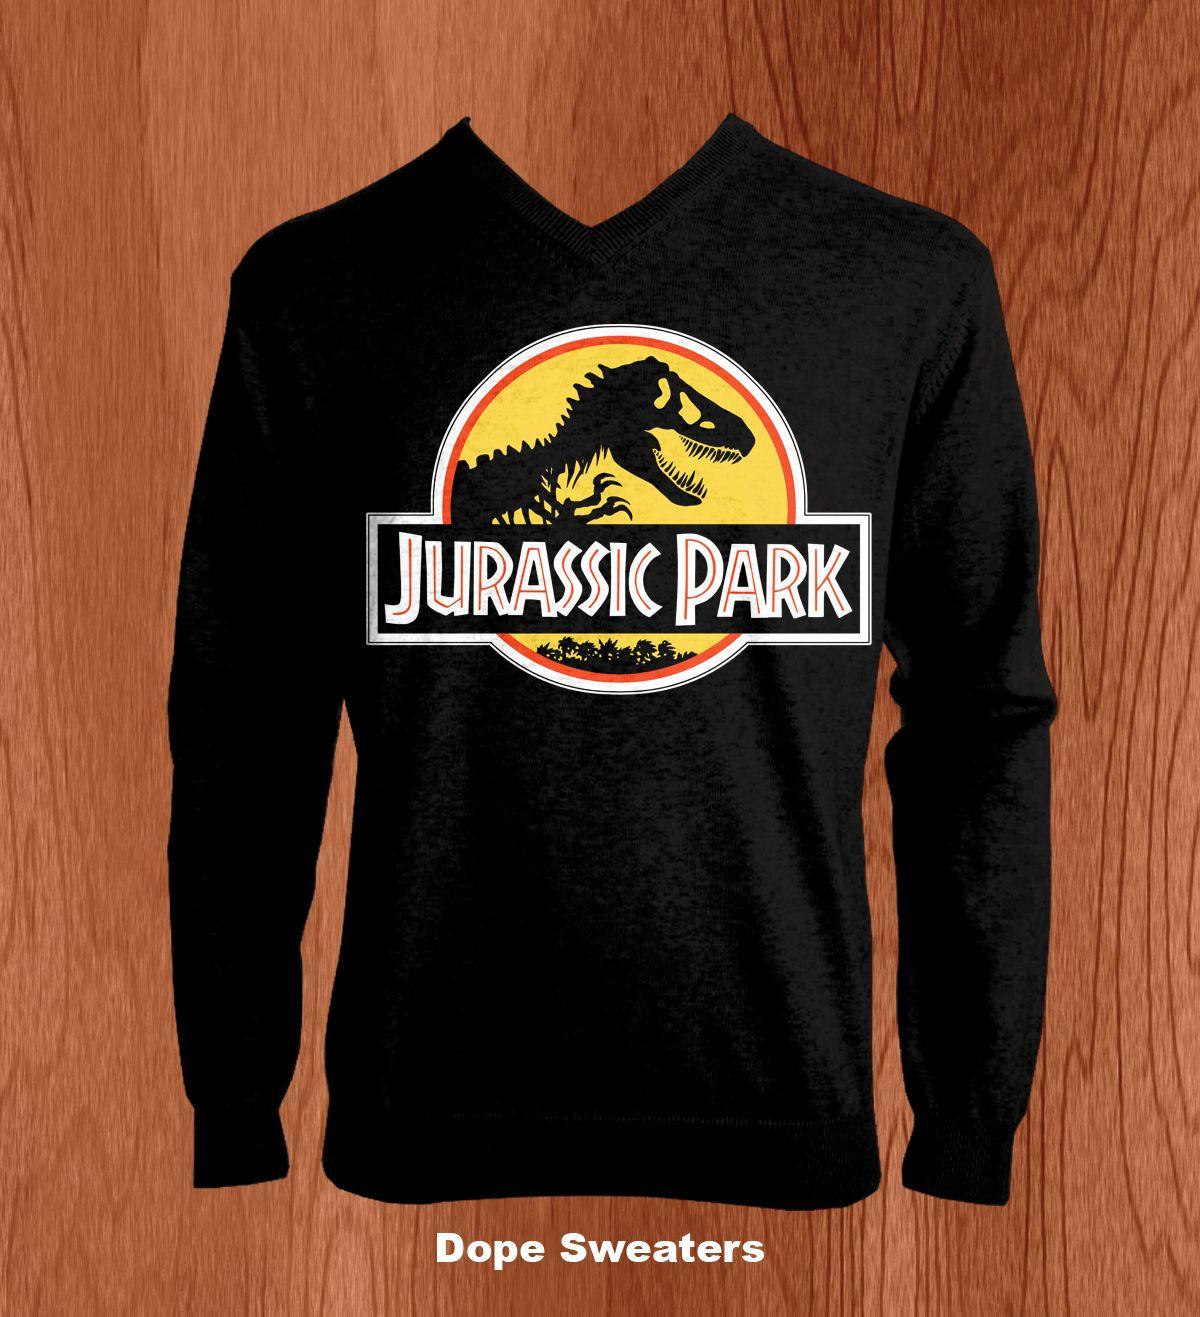 97831675 Jurassic Park Dope Sweaters, Jurassic World, Jurassic Park, Cute Jumpers,  Nerd Chic